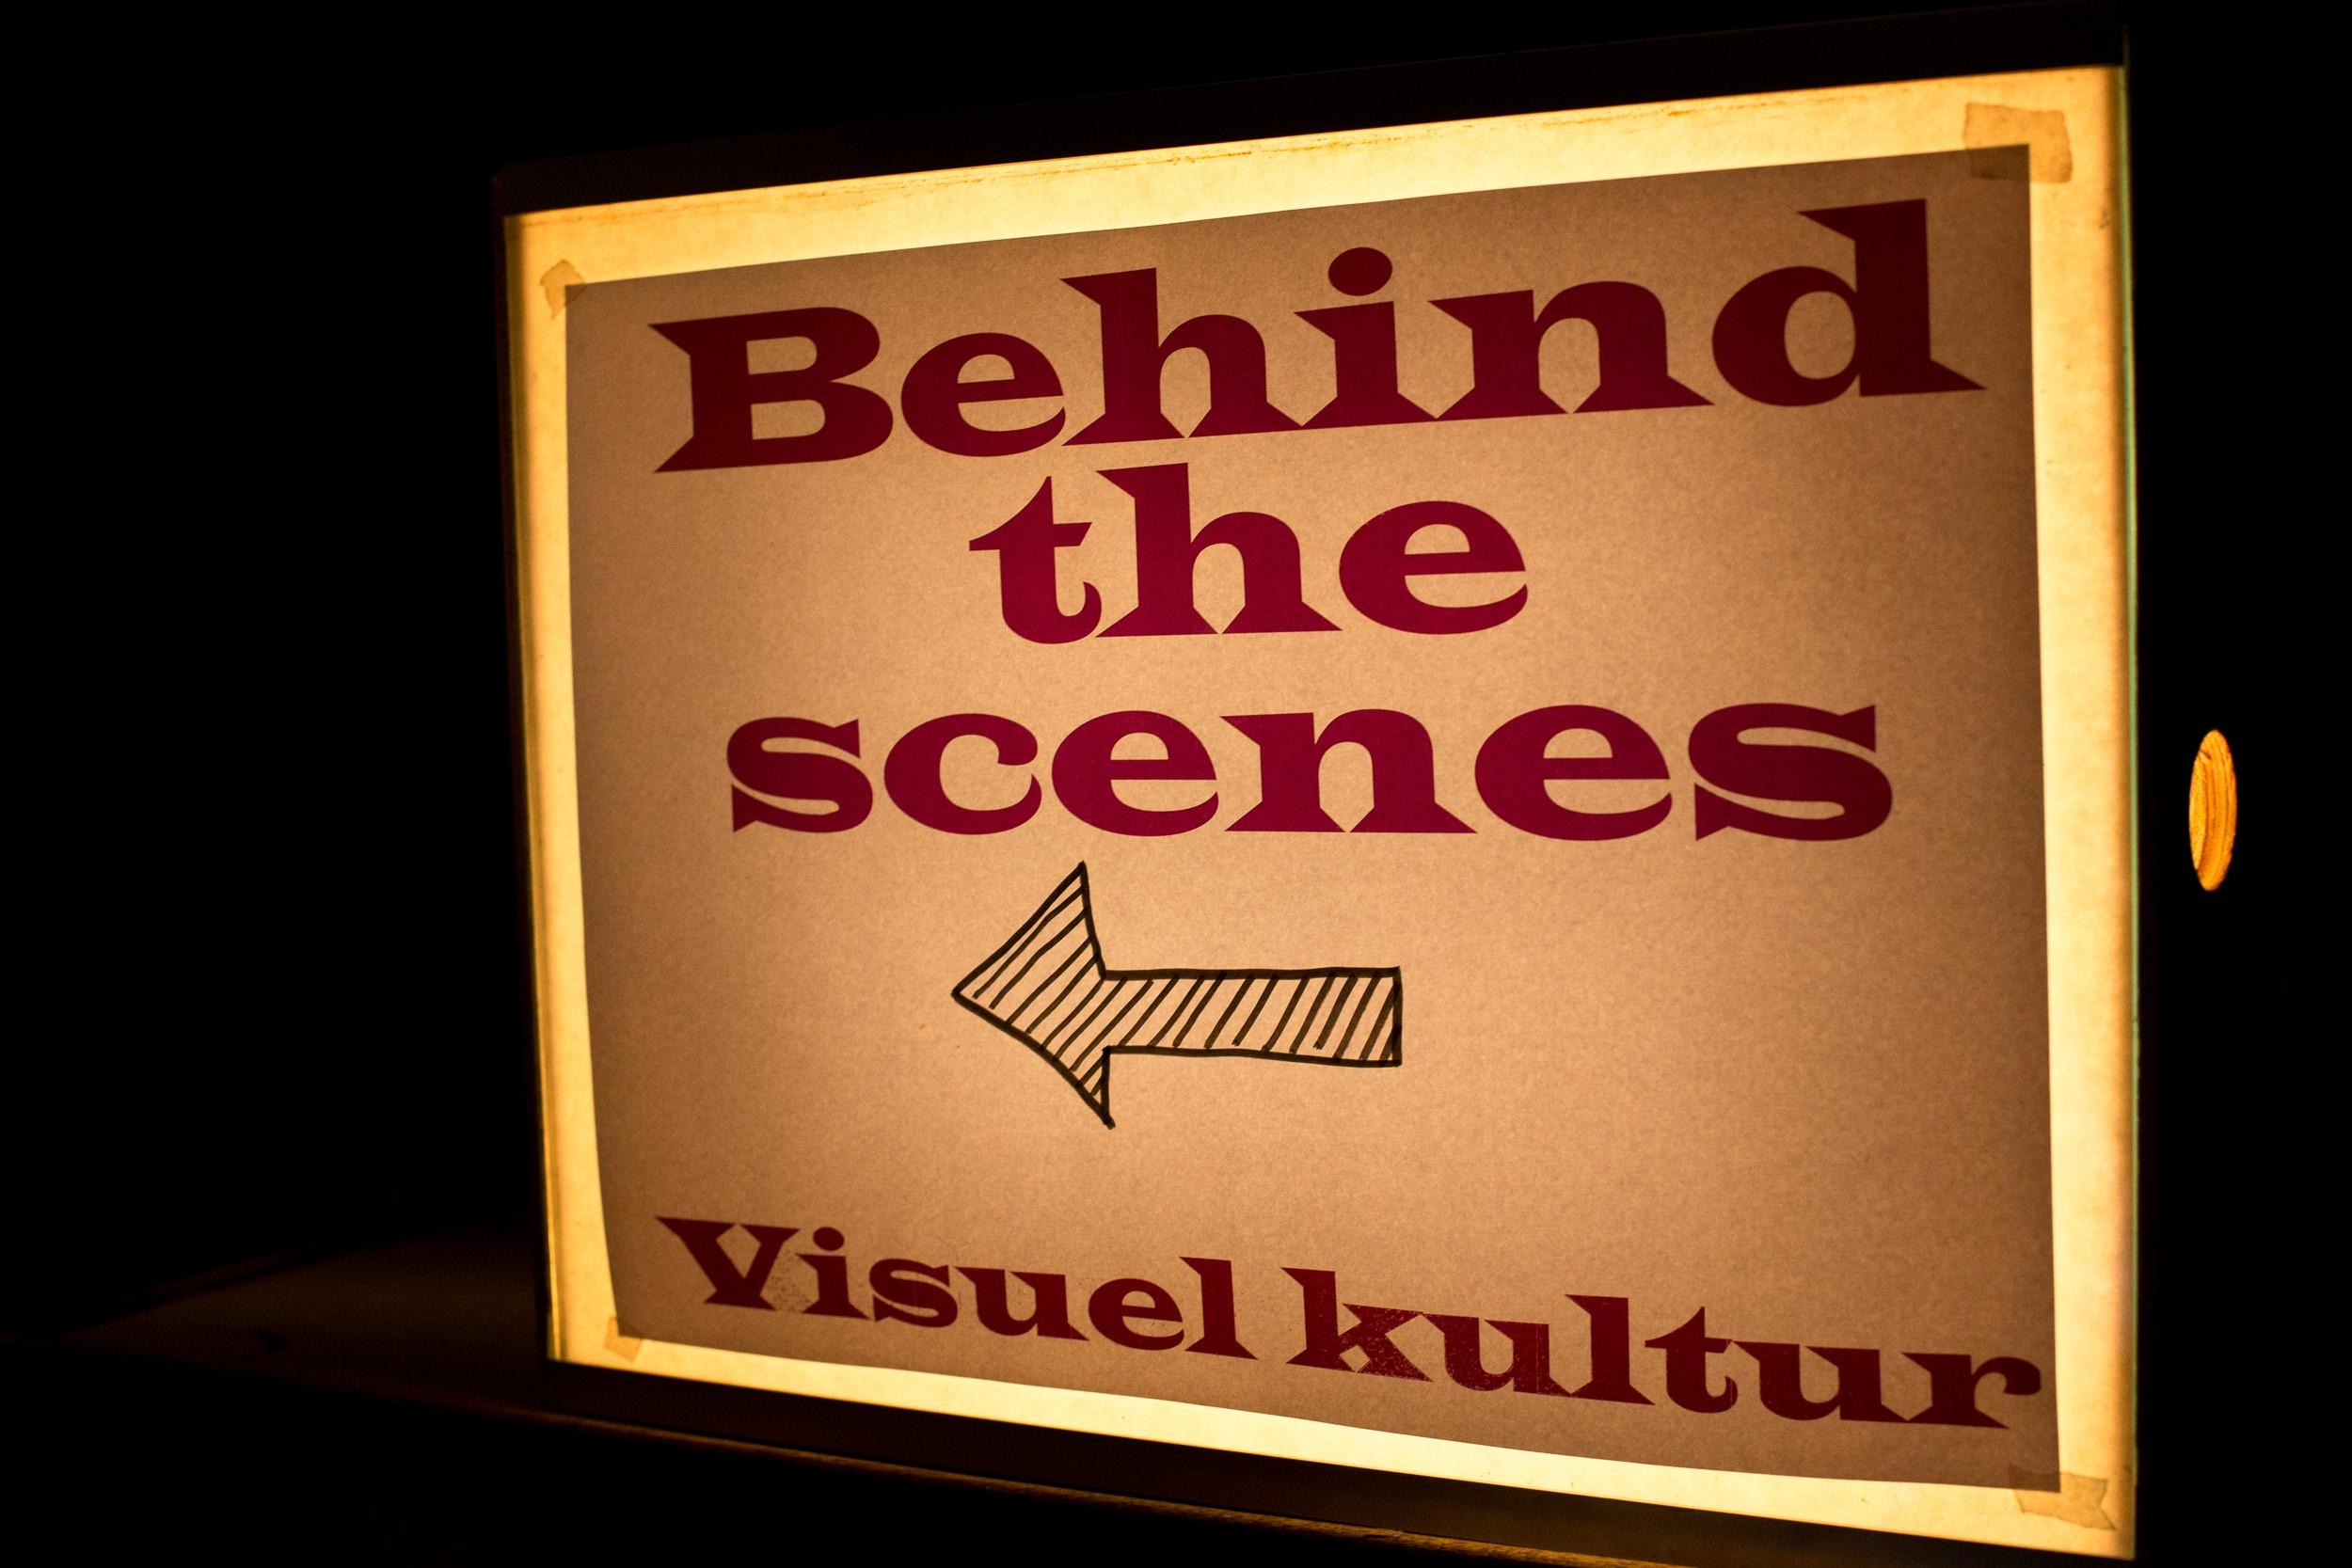 Visuel kultur på Kunsthøjskolen 2014